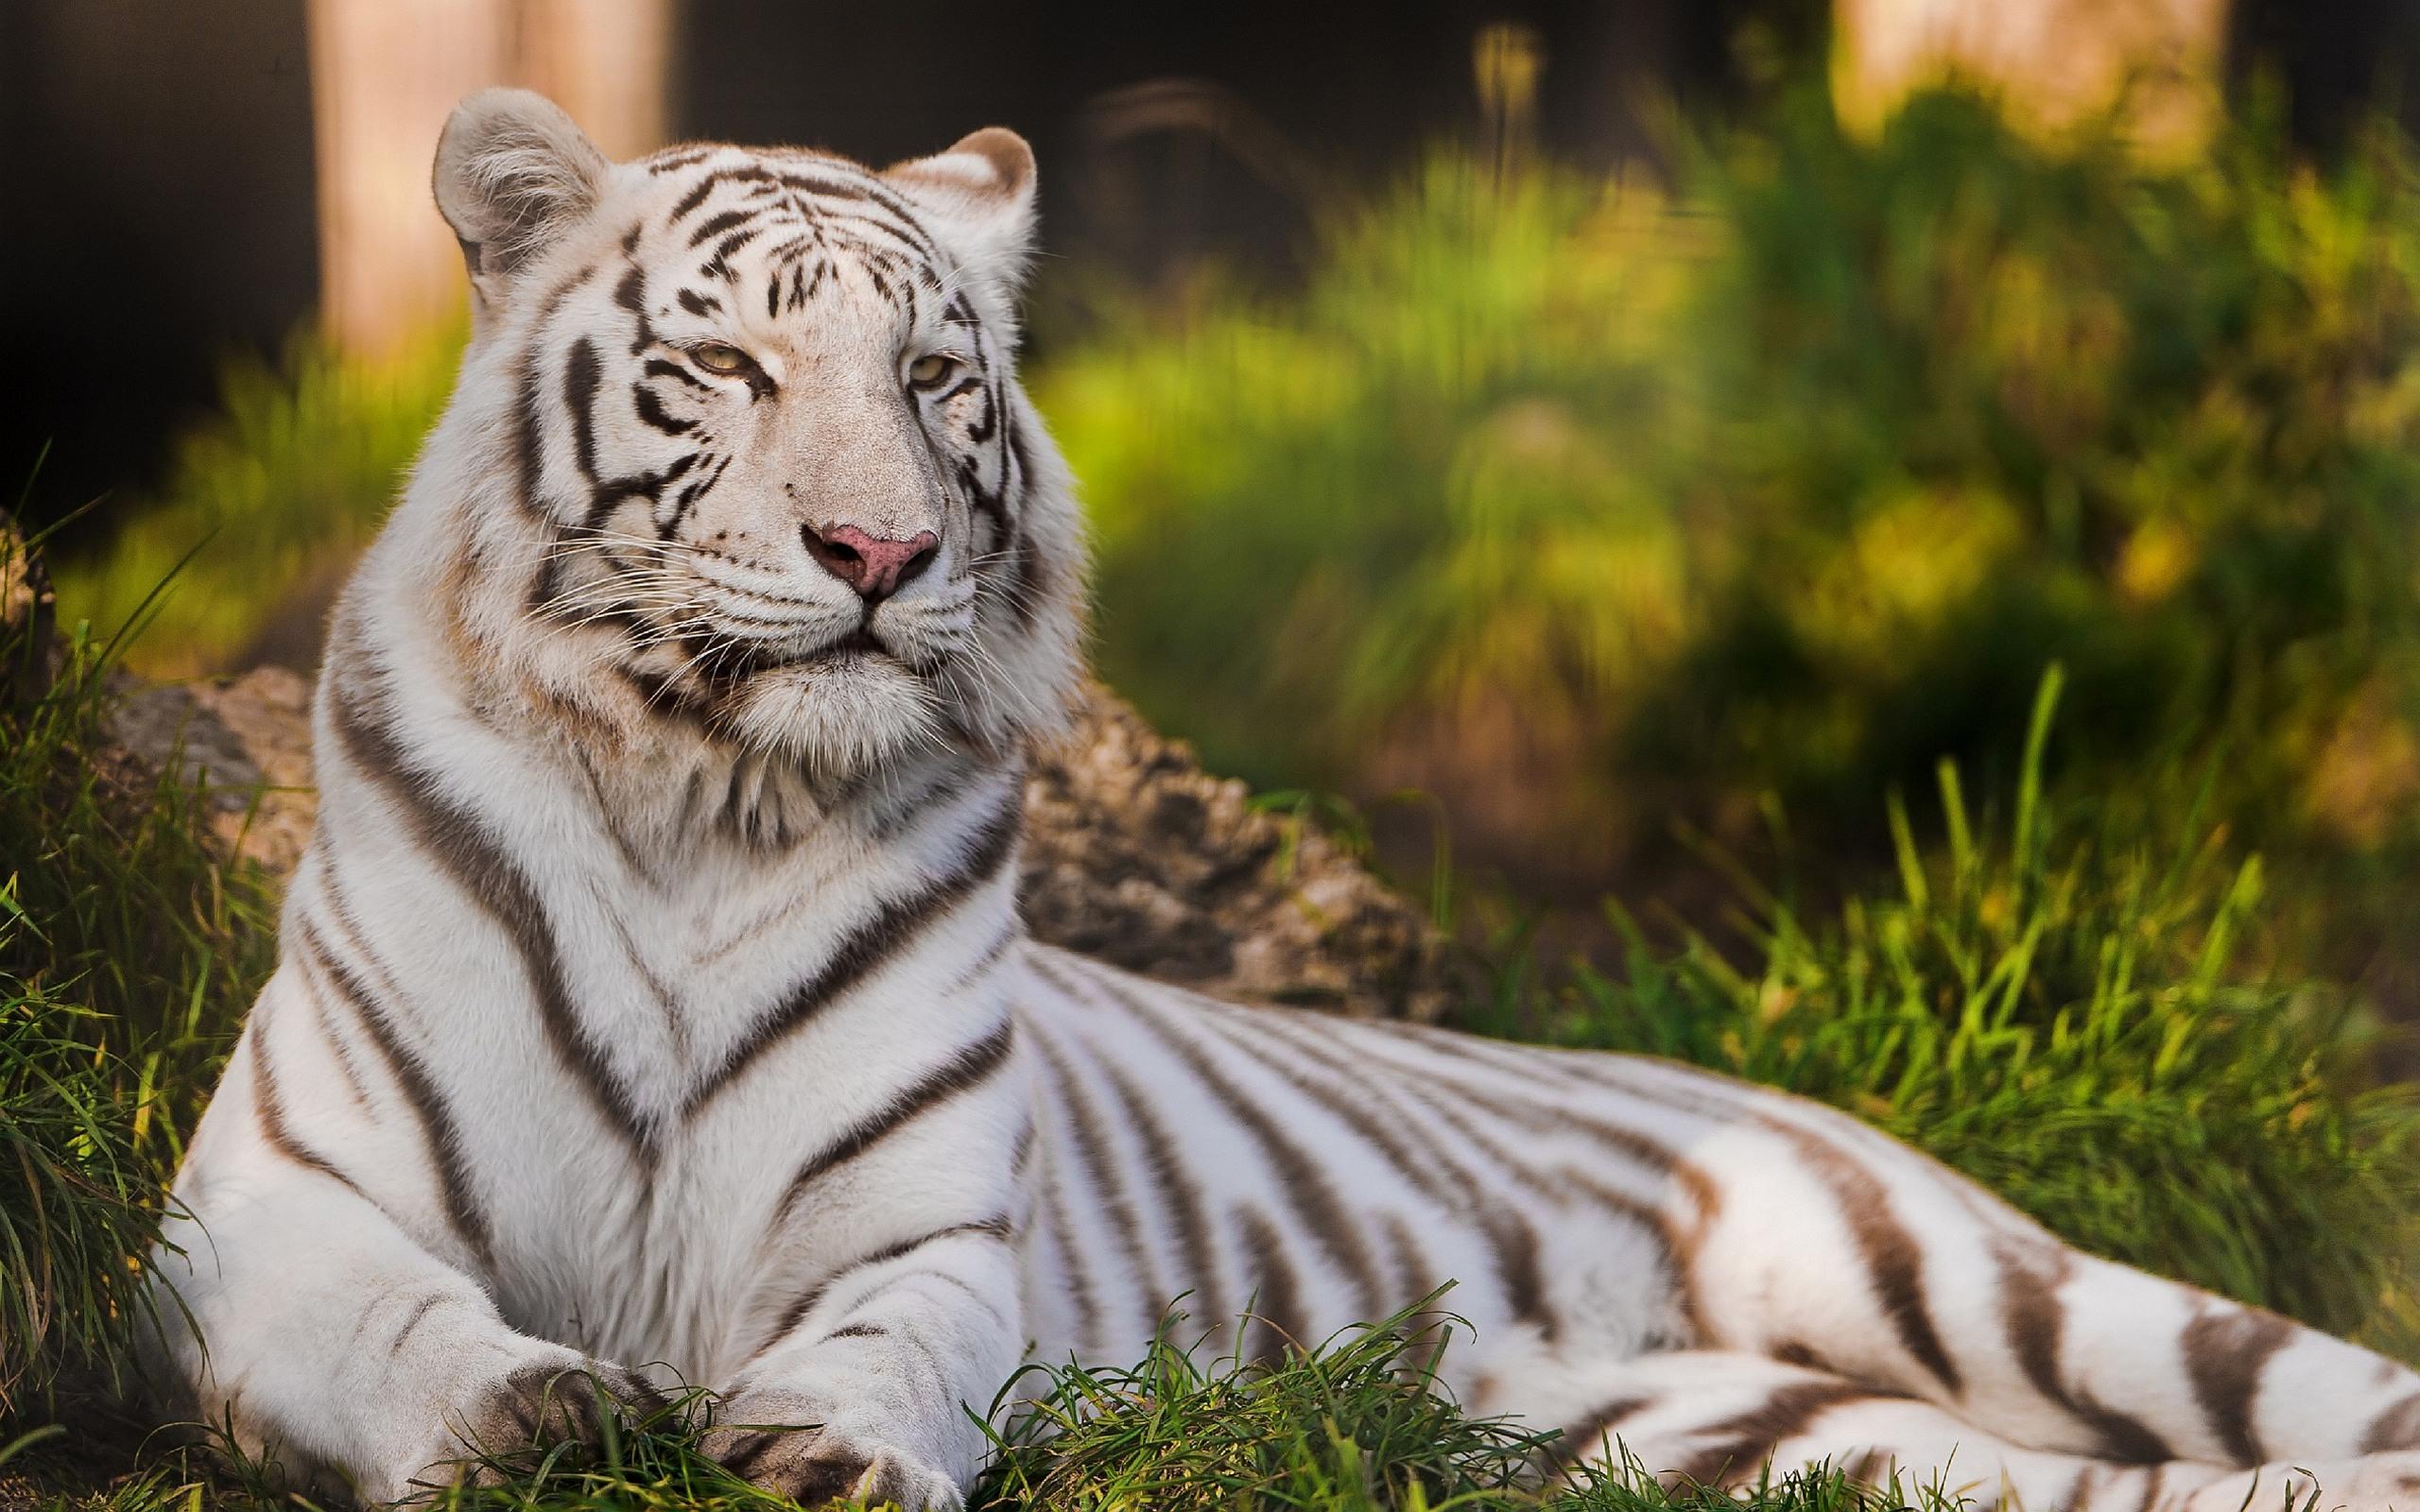 картинка белый тигр нарисованный